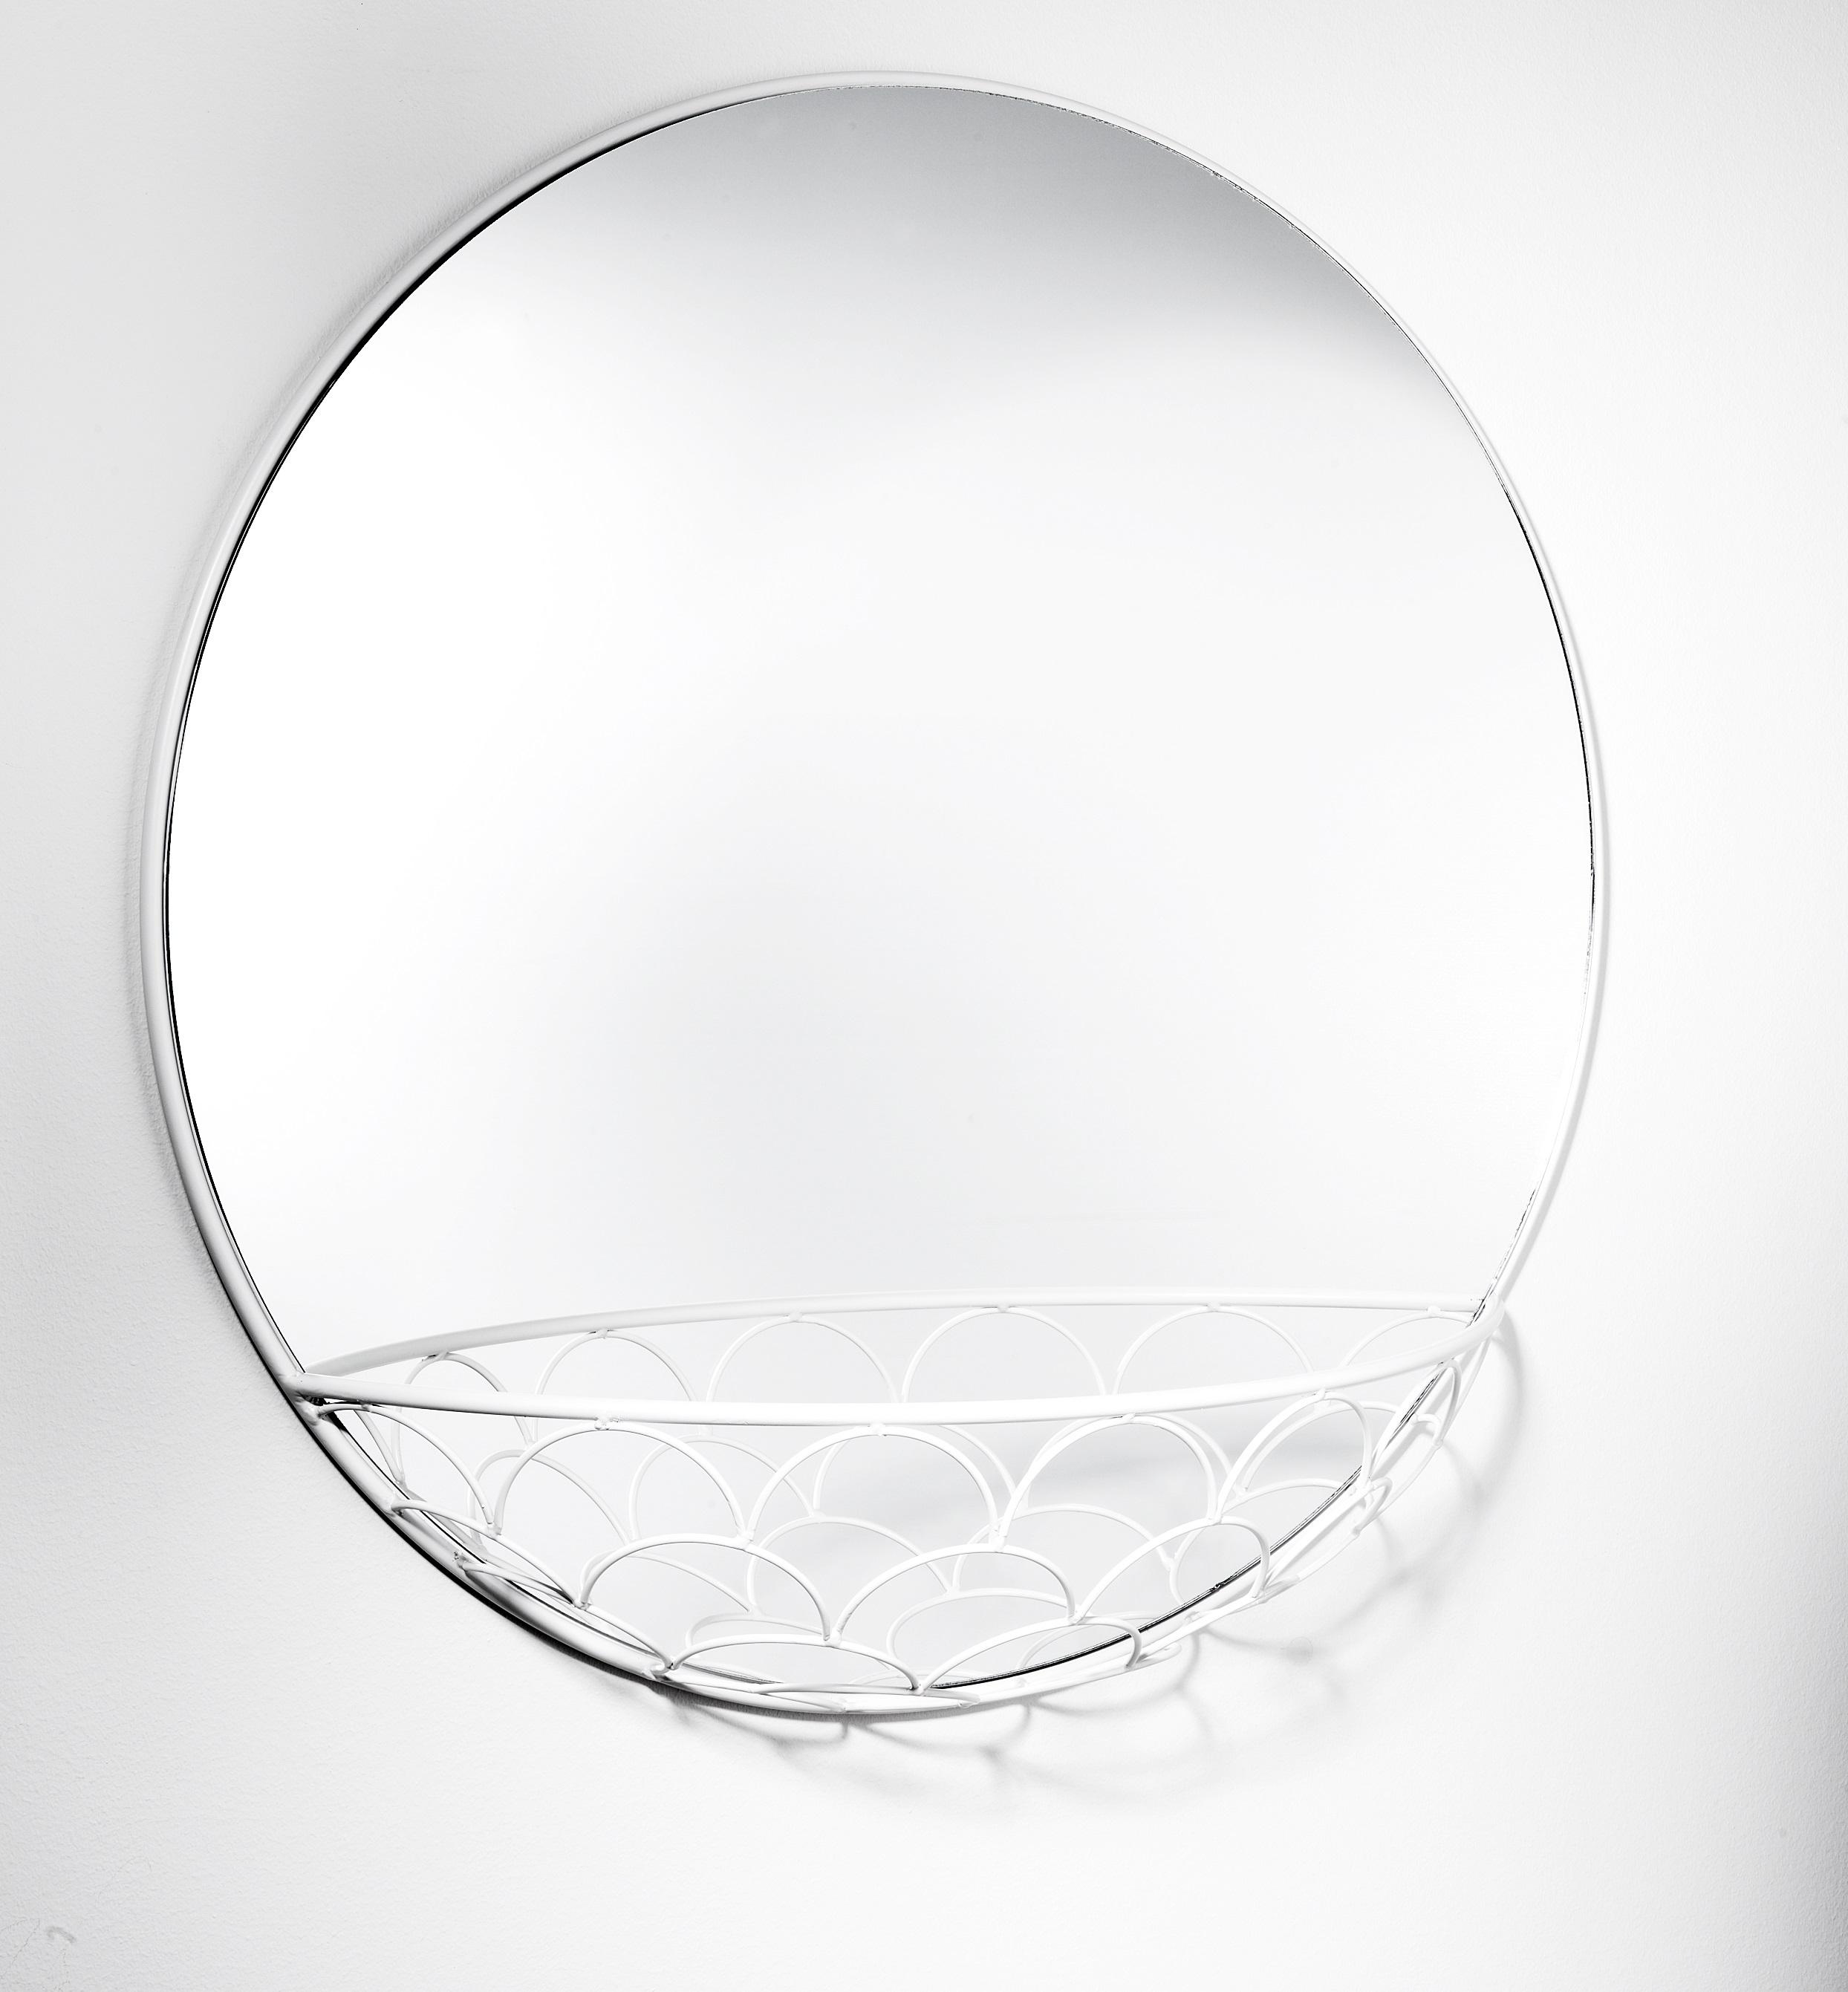 Haga 800 spegel